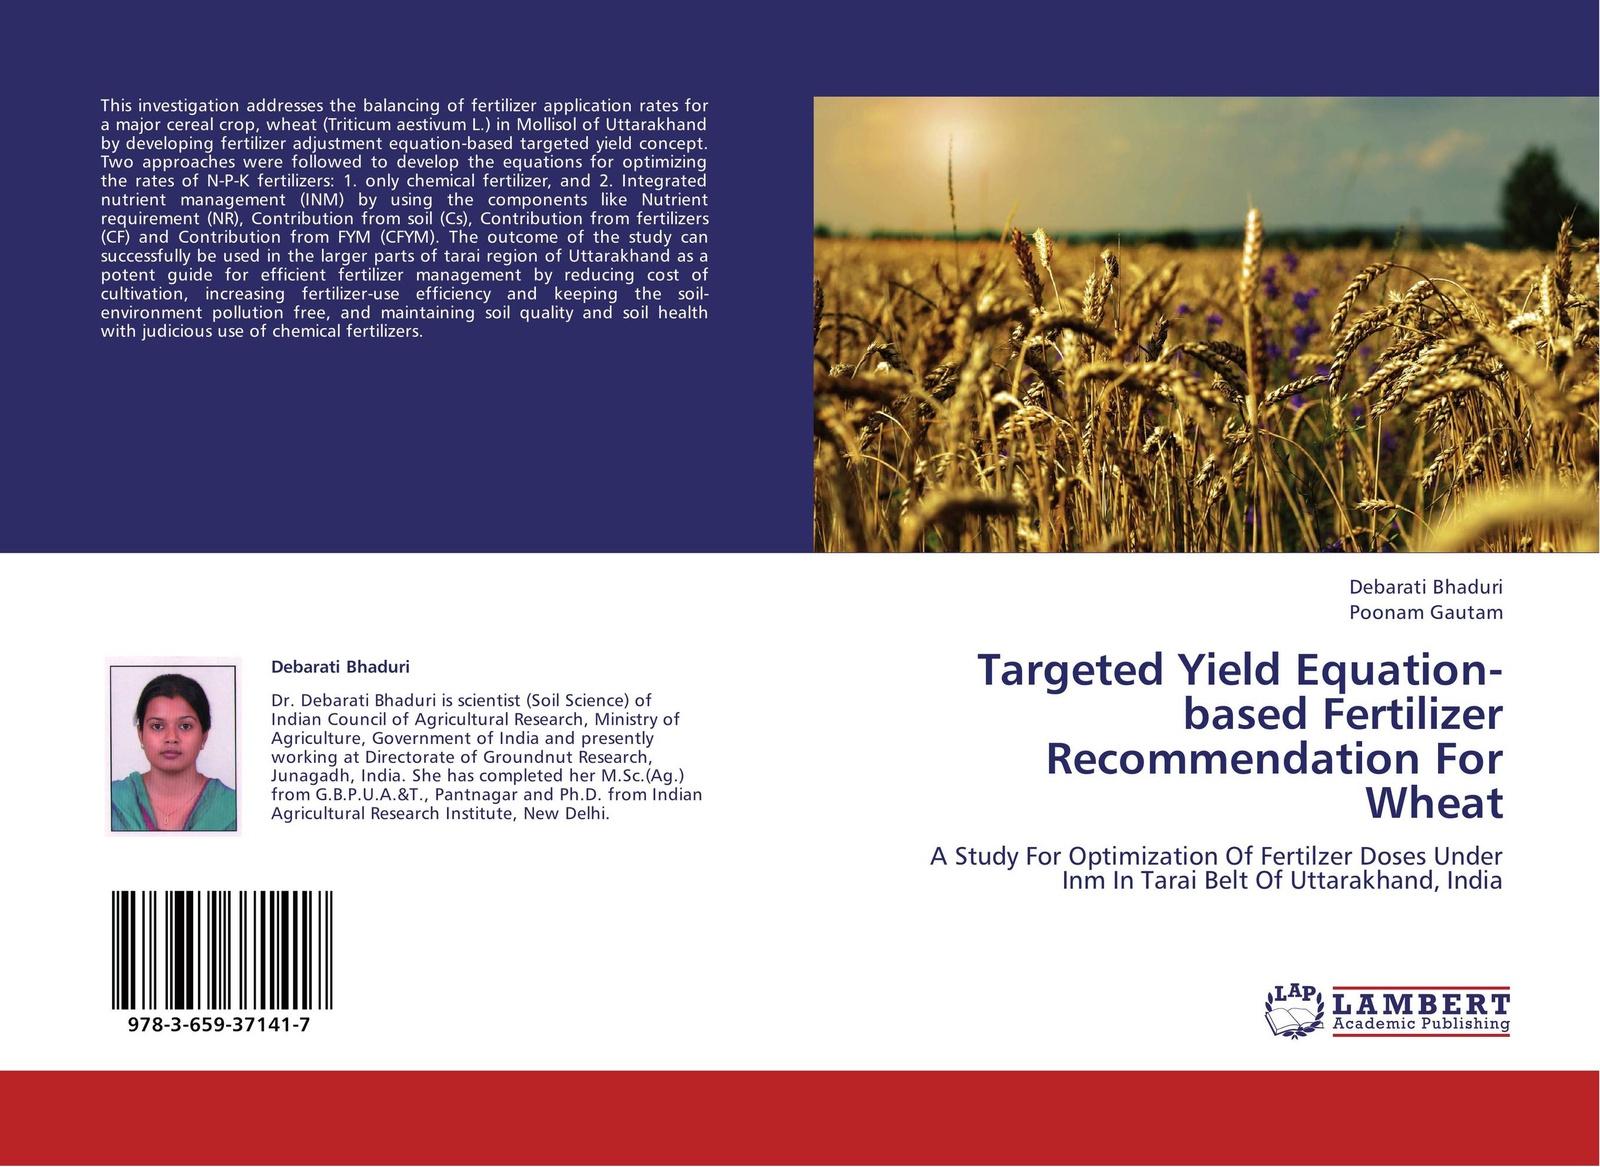 Debarati Bhaduri and Poonam Gautam Targeted Yield Equation-based Fertilizer Recommendation For Wheat pragnesh dave and jaspal b sukhdiya preparation of chitosan nanoparticals coated k fertilizers